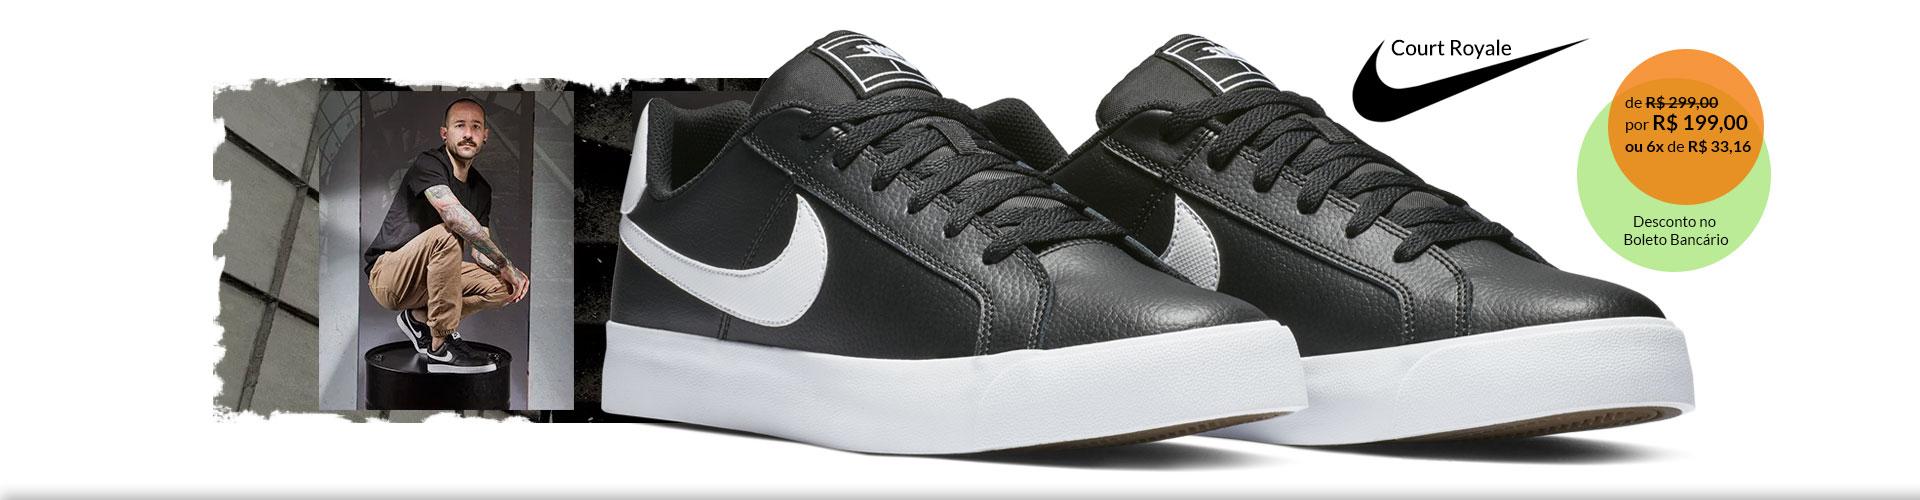 full-sapato-court-royale-masculino-nike-bq4222